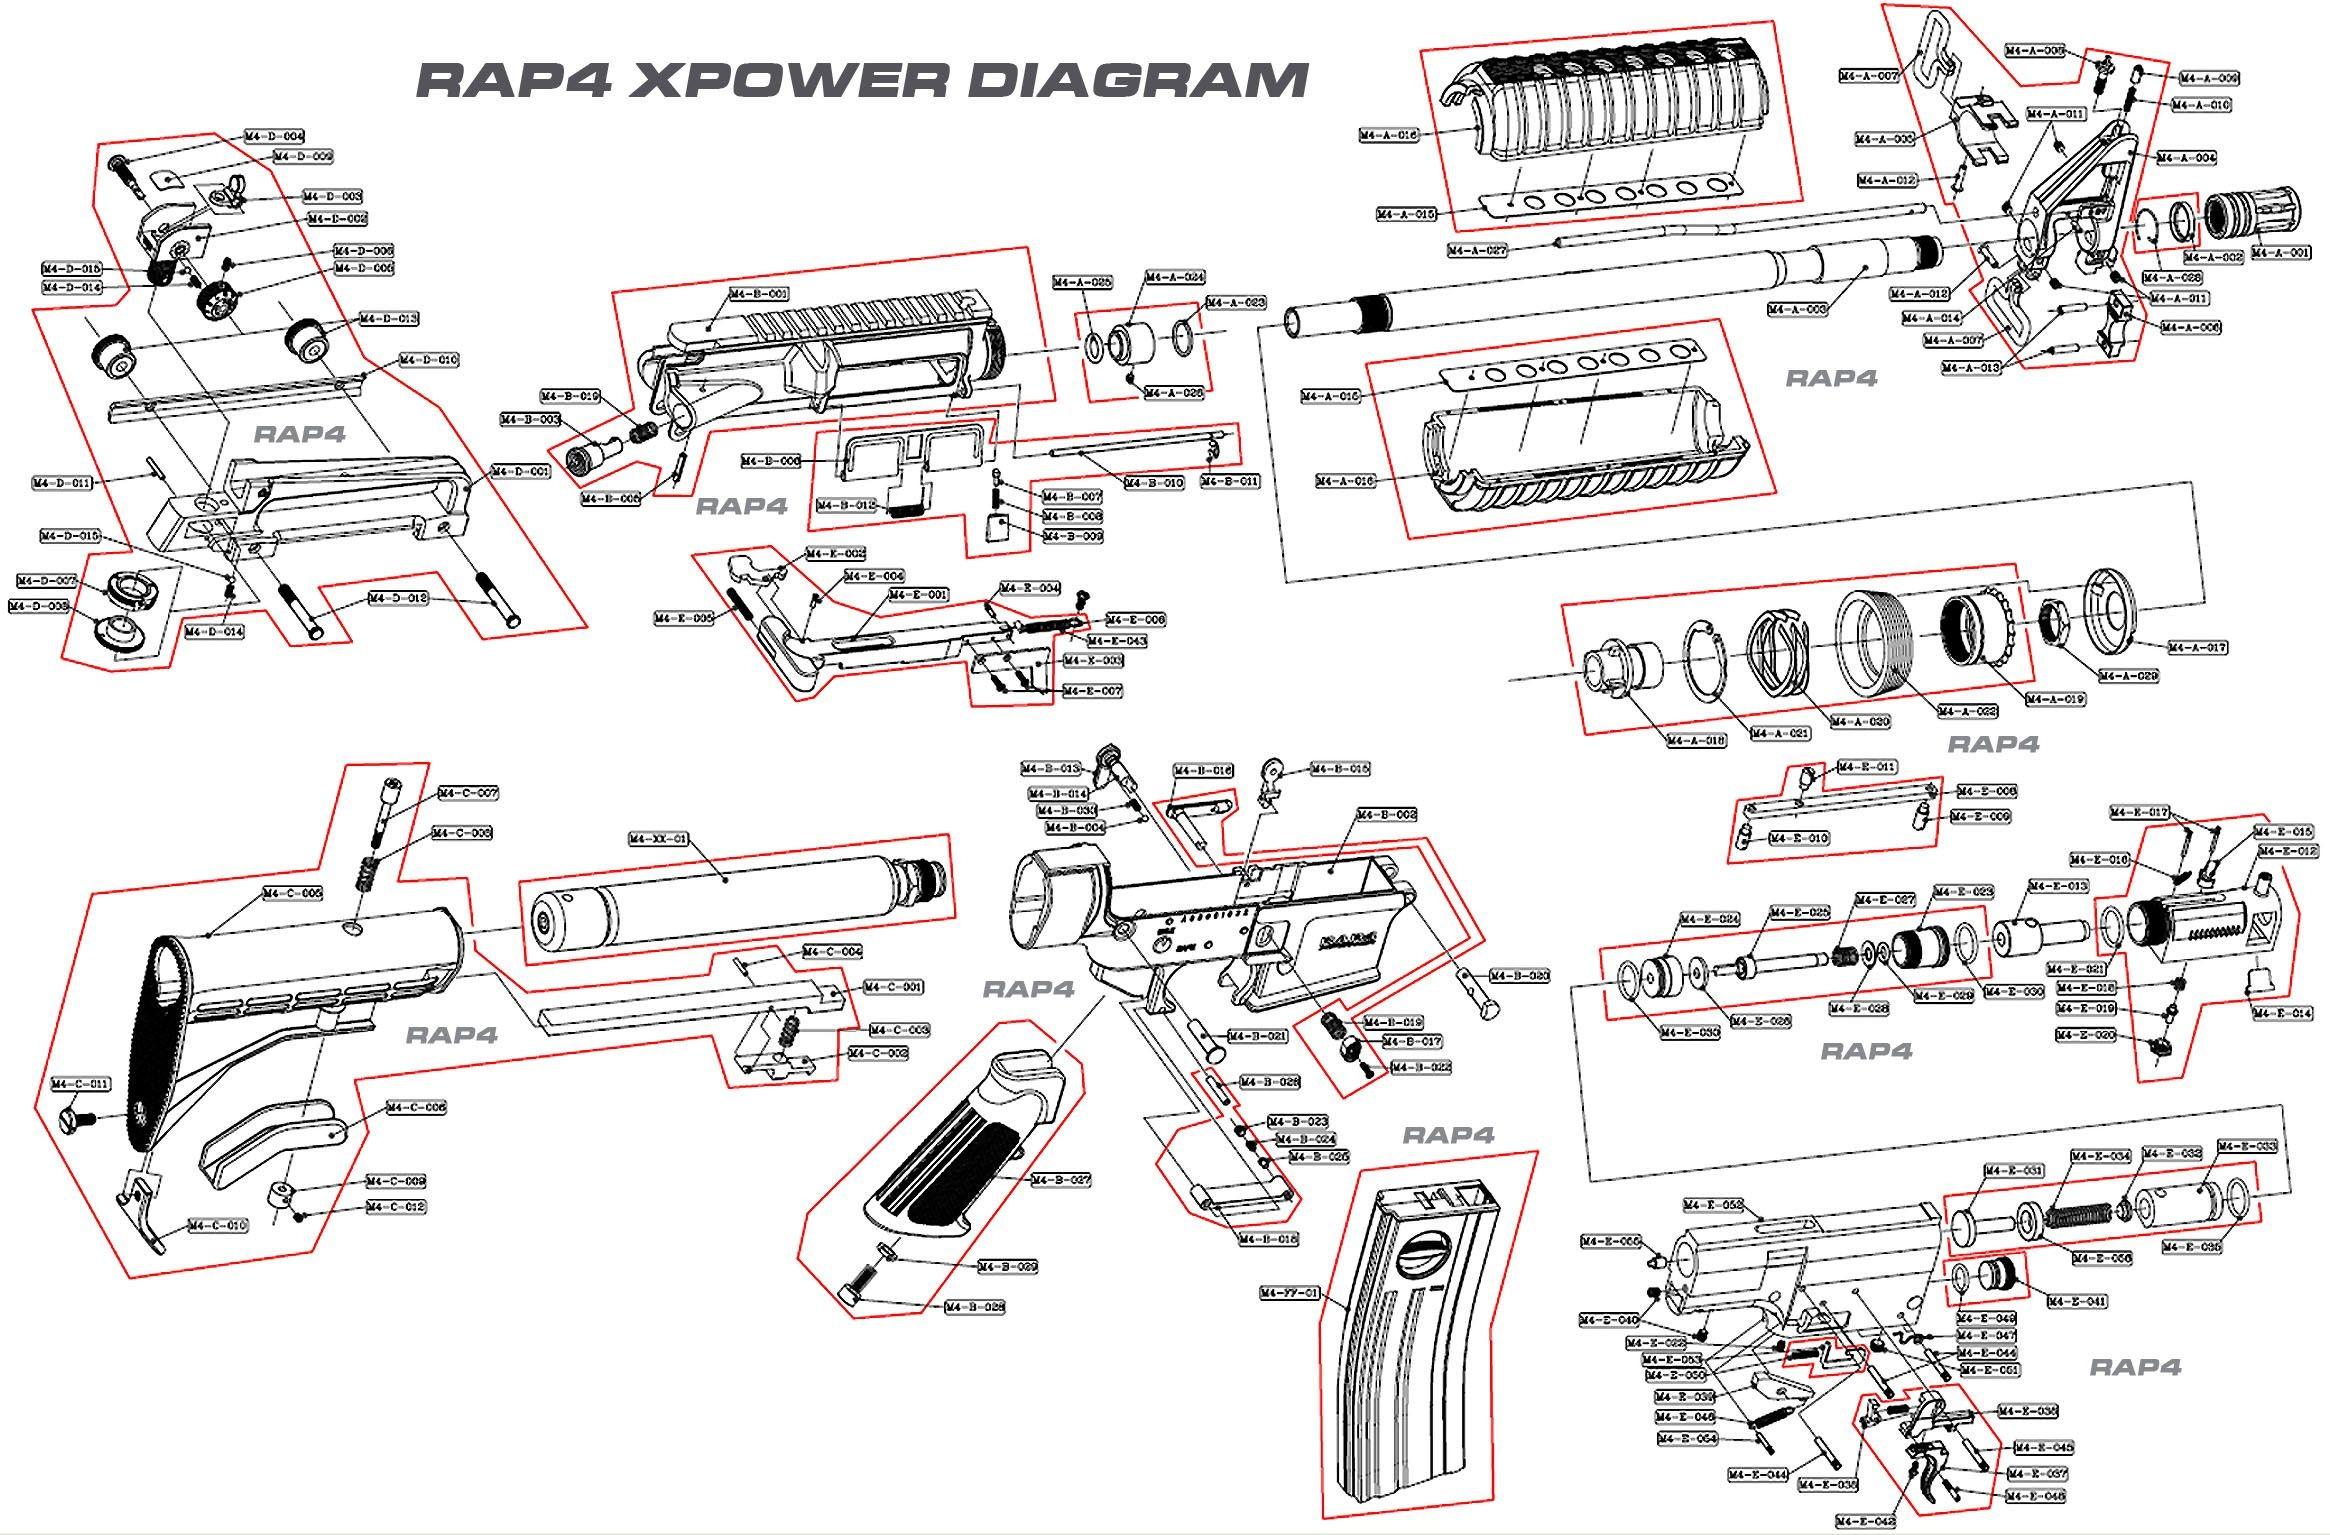 Diagram Of All Car Parts M4 Schematic Of Diagram Of All Car Parts